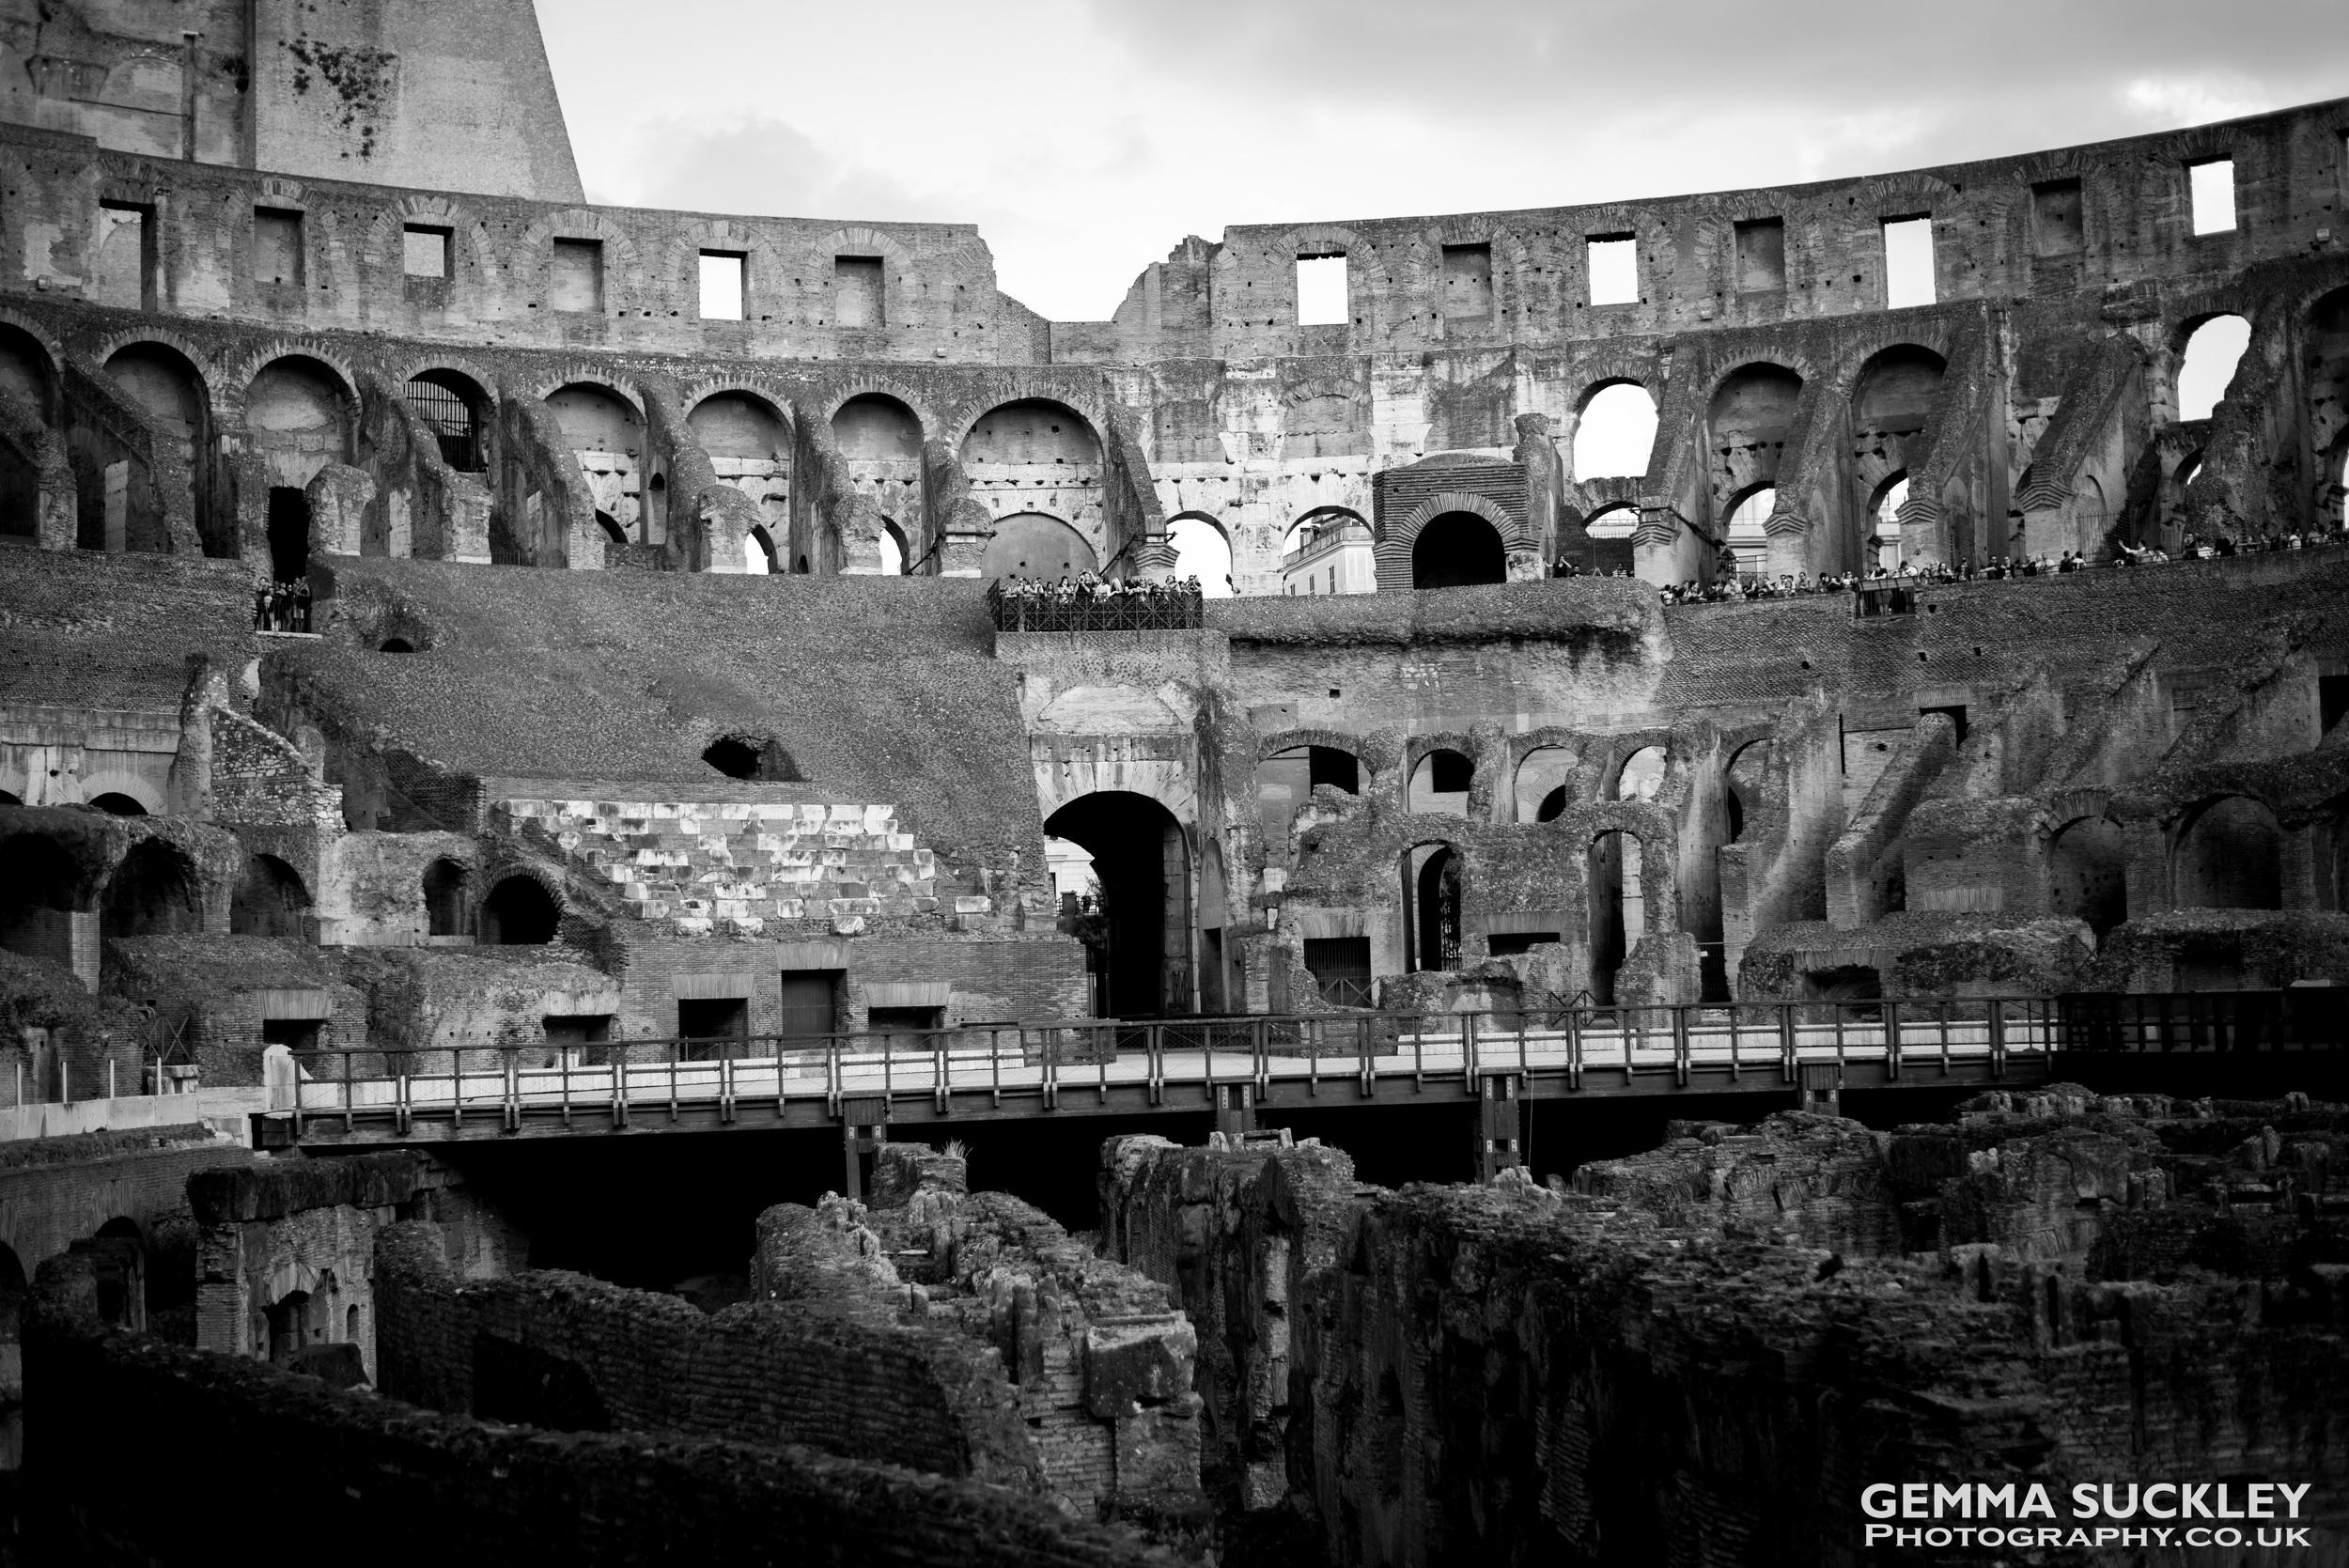 The- colosseum-rome.jpg